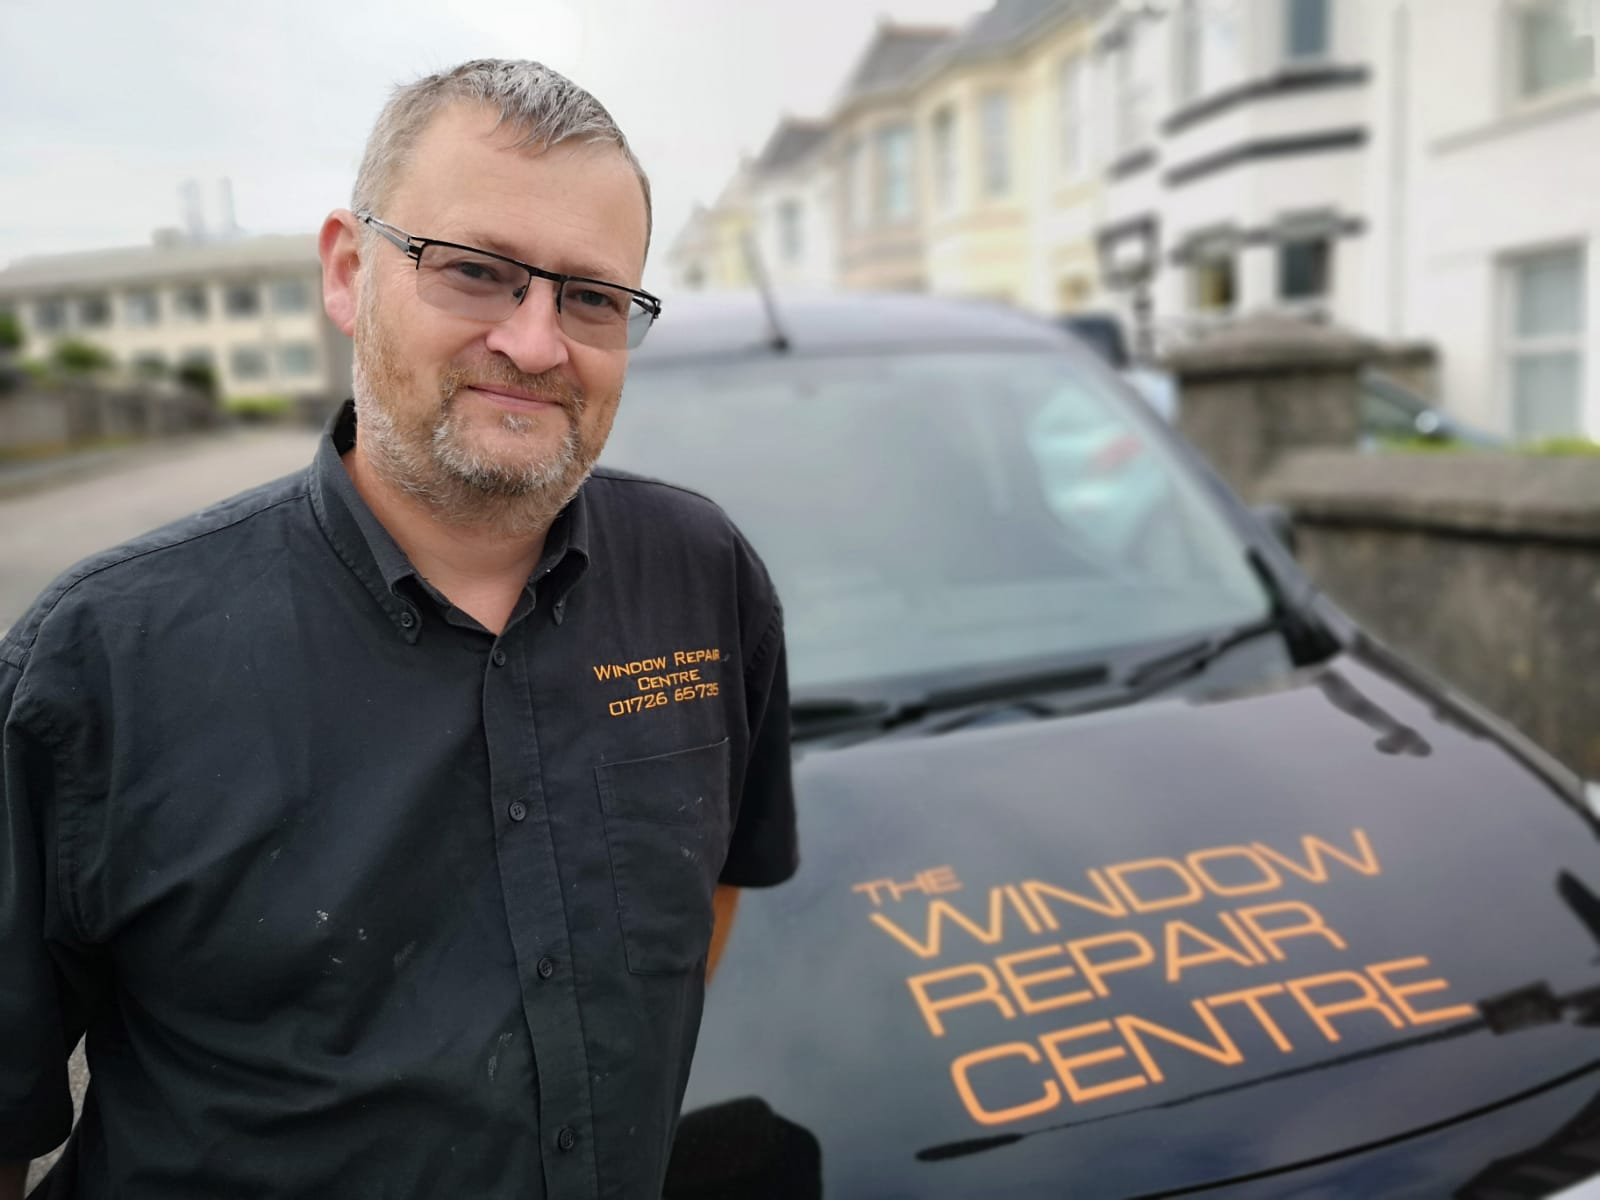 Gary at the Window Repair Centre Cornwall